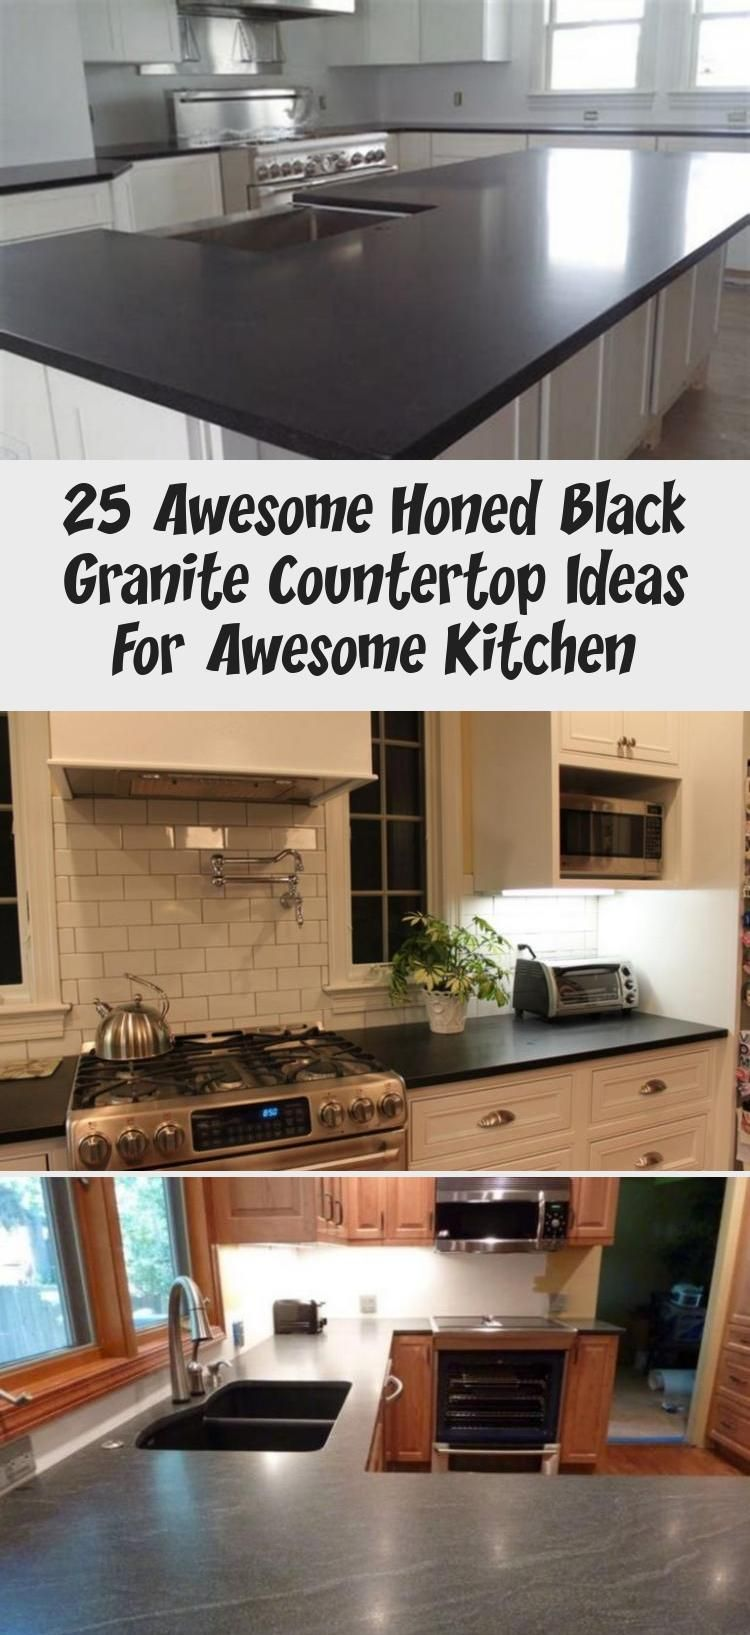 en blog en blog in 2020 unique kitchen countertops black granite countertops granite on kitchen decor black countertop id=83718